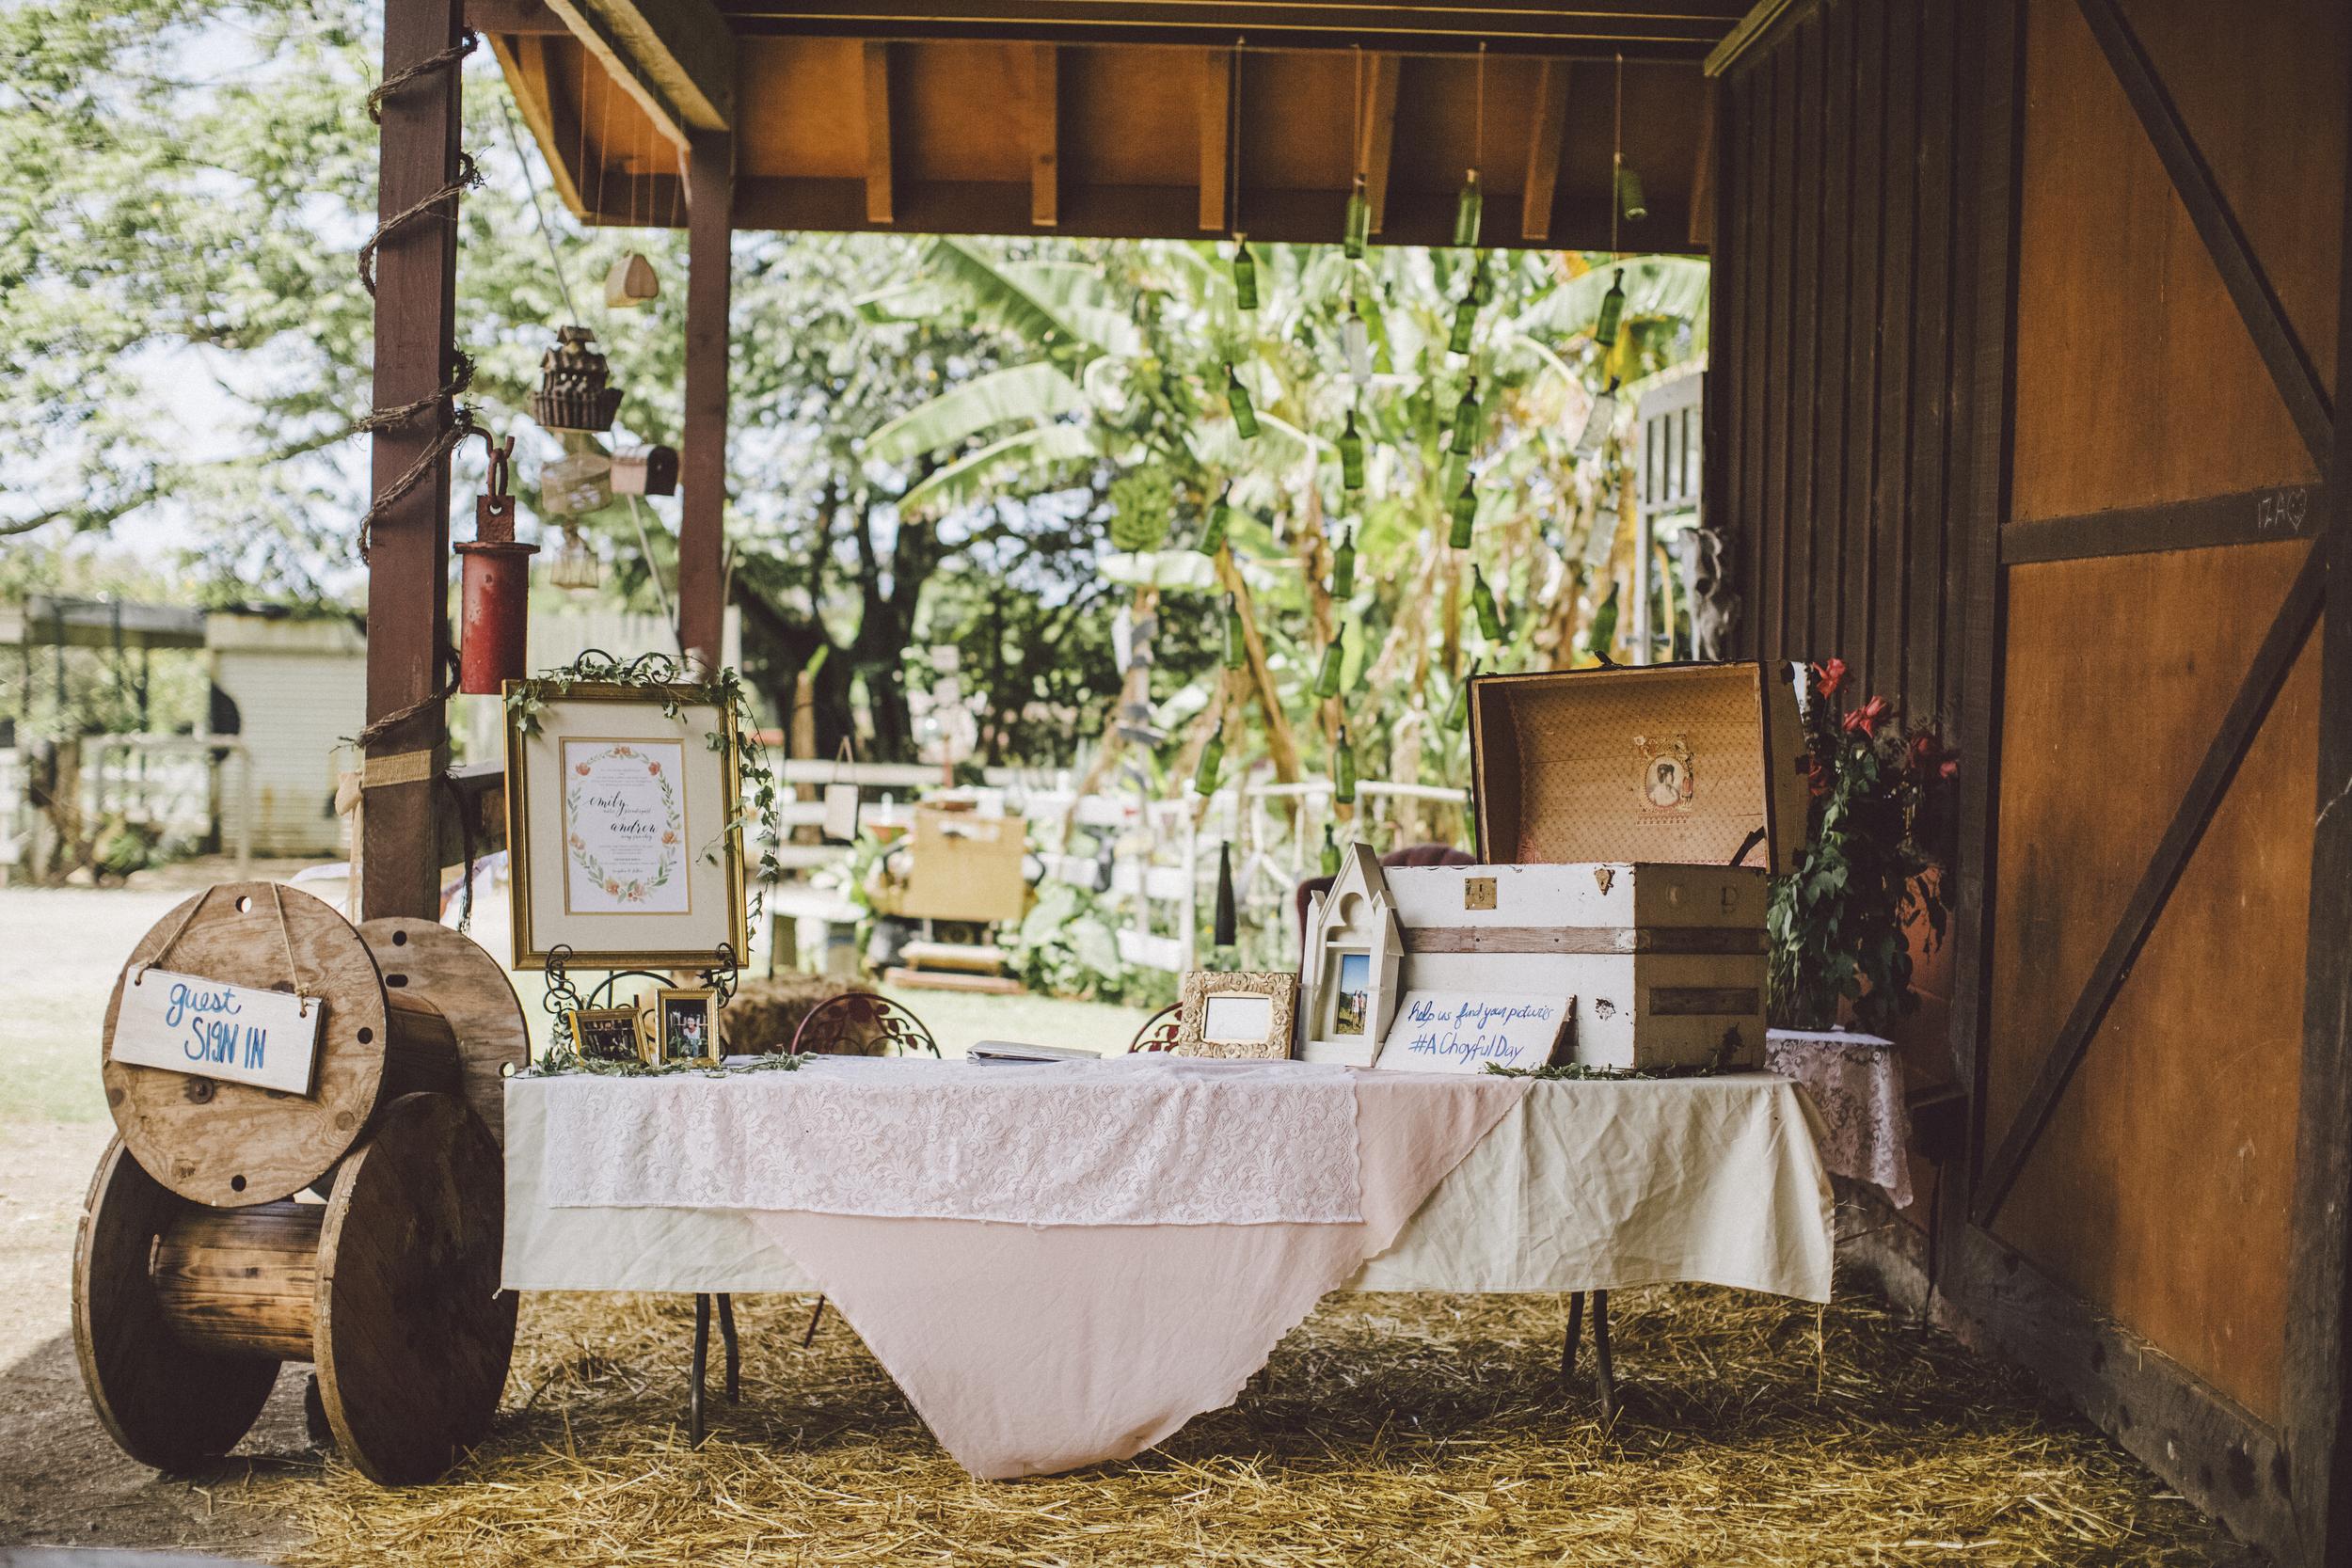 angie-diaz-photography-oahu-hawaii-wedding-tradewinds-ranch-44.jpg